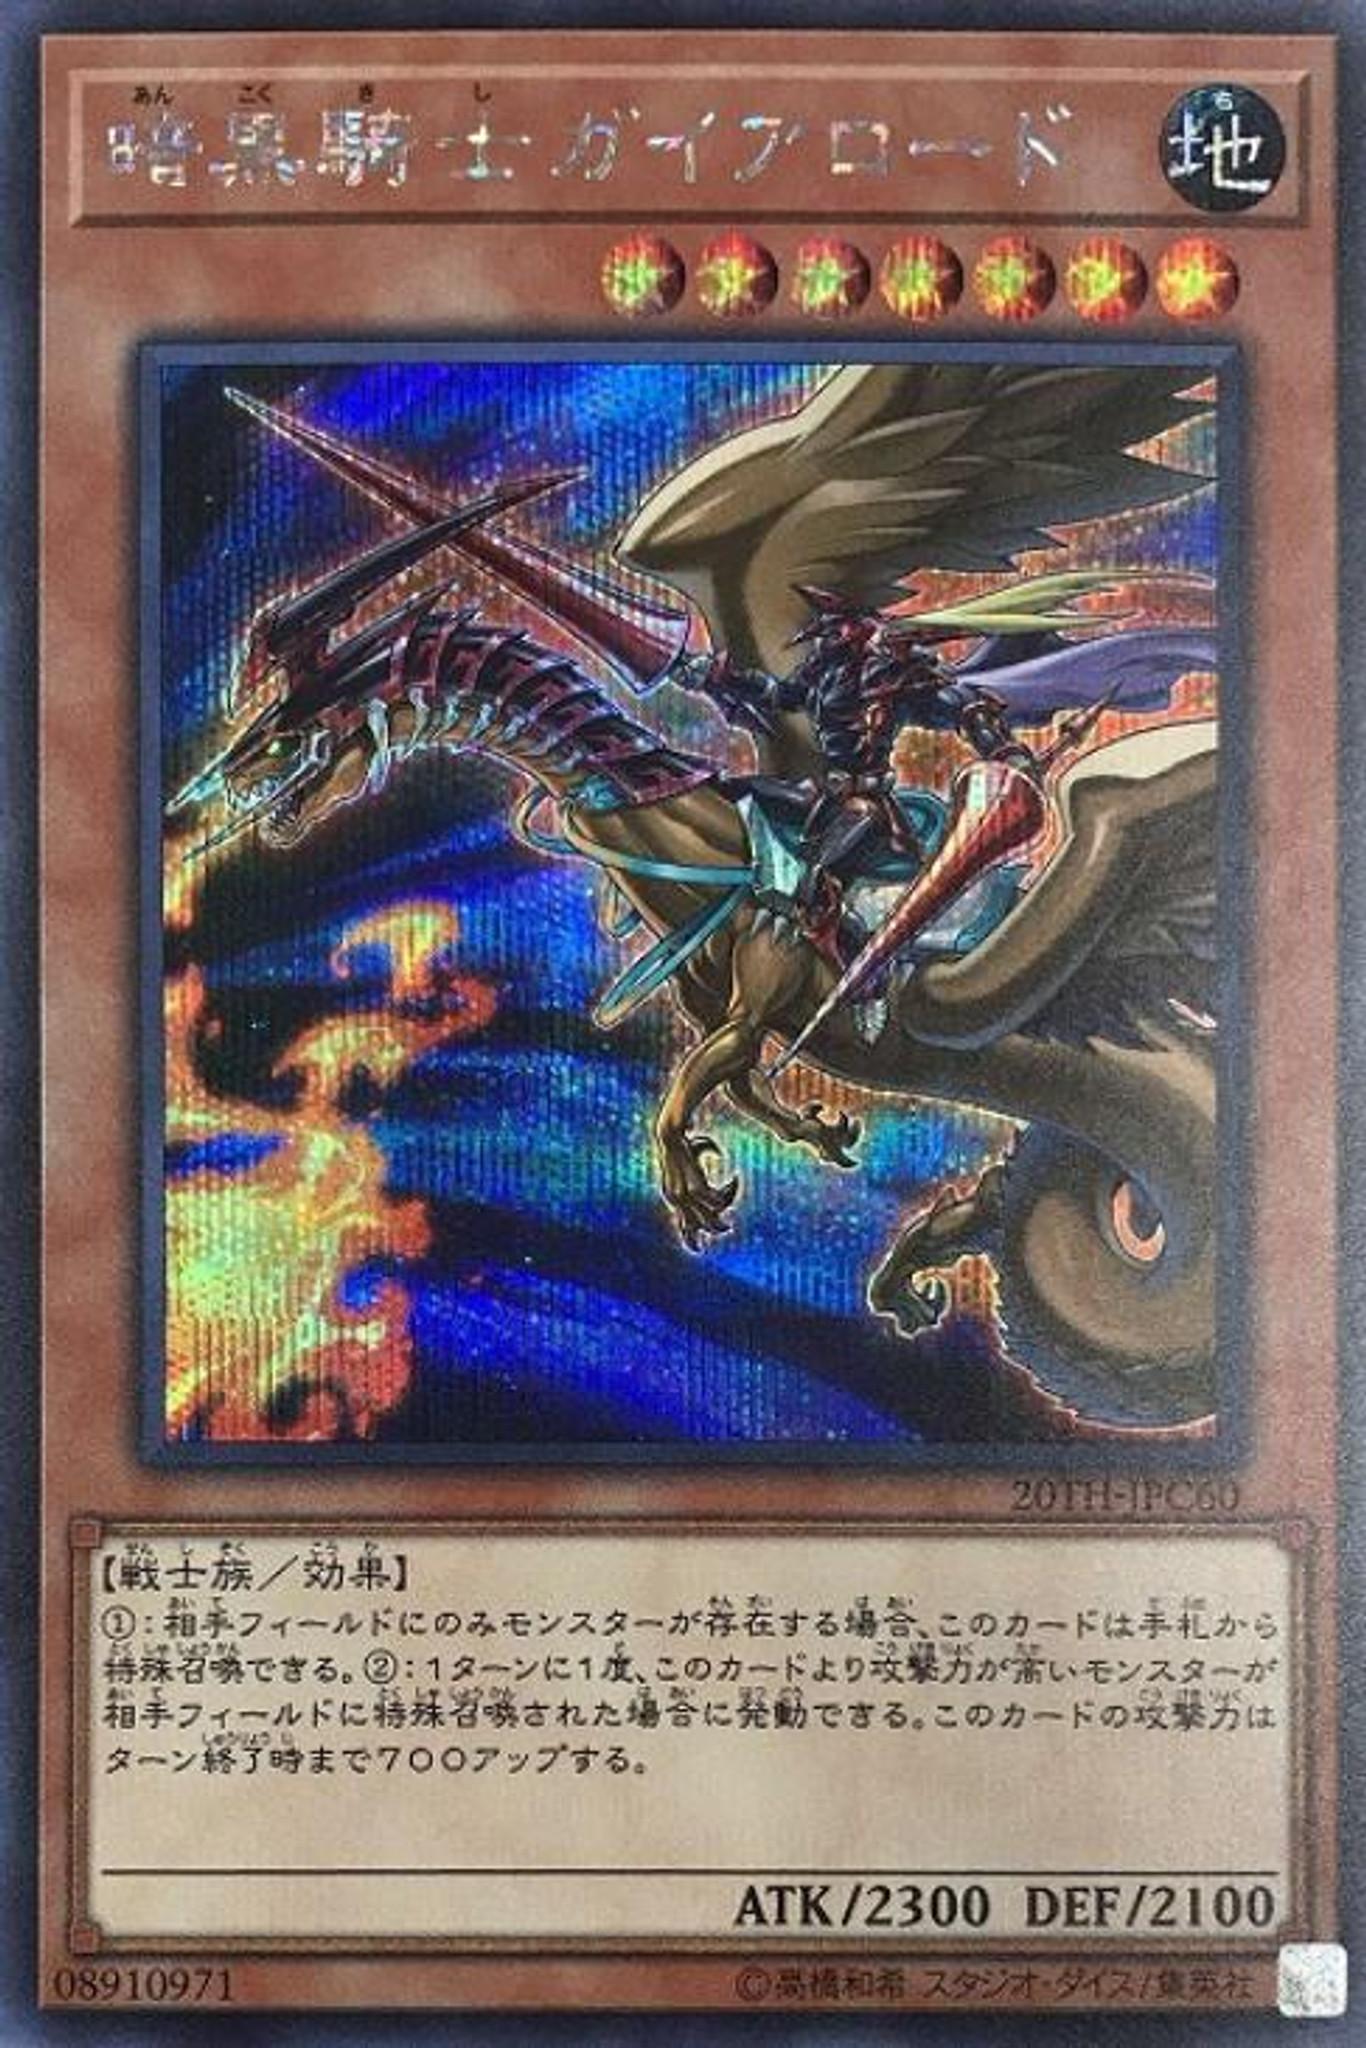 Lord Gaia The Fierce Knight 20th Jpc60 Secret Rare